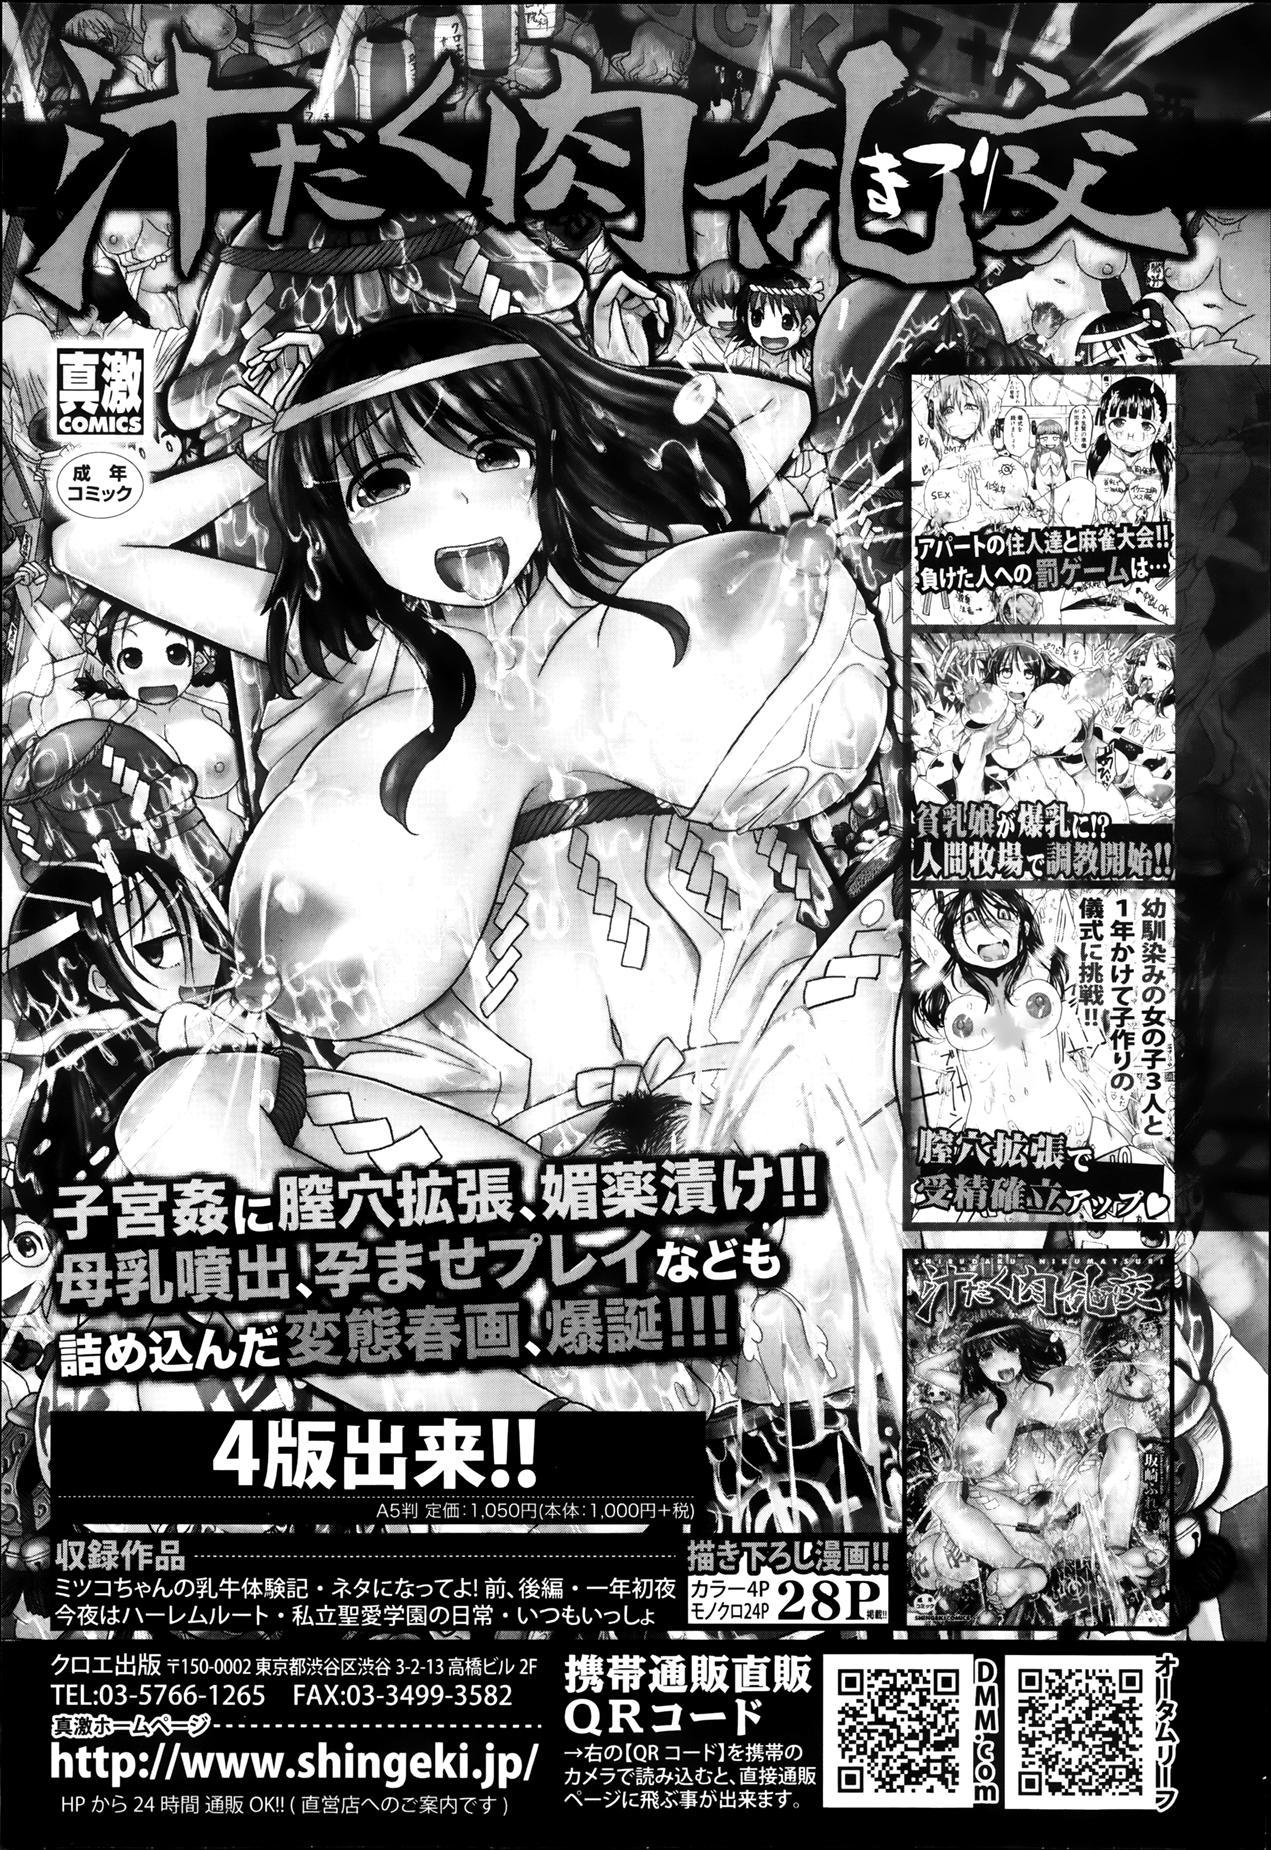 COMIC Shingeki 2013-08 39